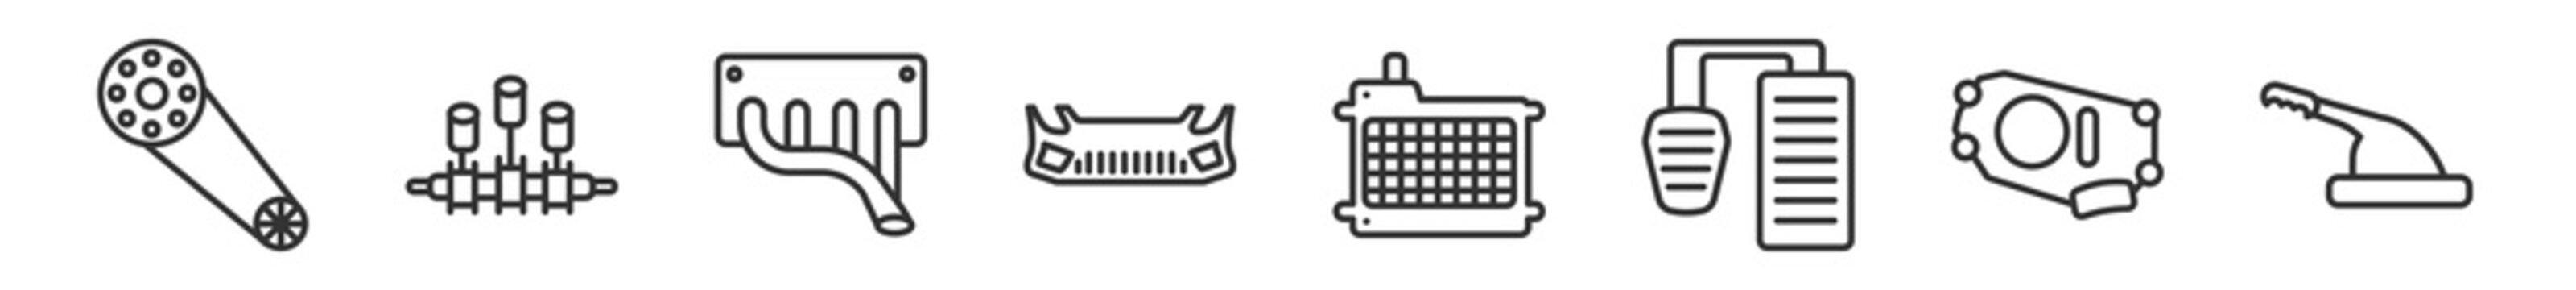 outline set of car parts line icons. linear vector icons such as car camshaft, car crankshaft, manifold, bumper, radiator, handbrake. vector illustration.